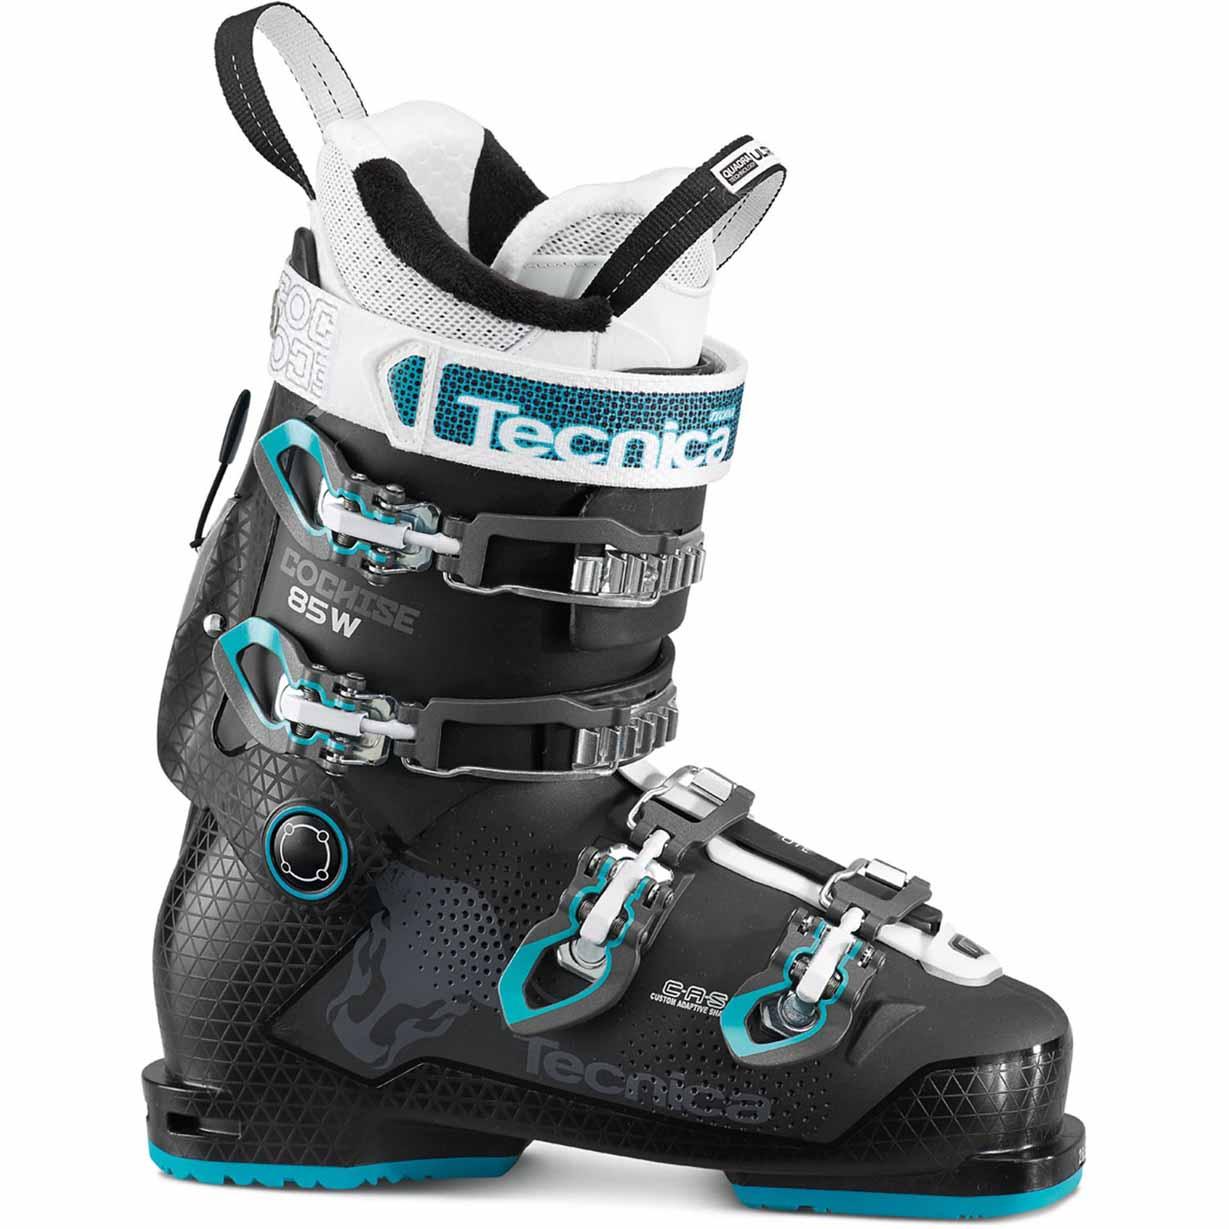 2017-18 Tecnica Cochise 85 Womens Ski Boot